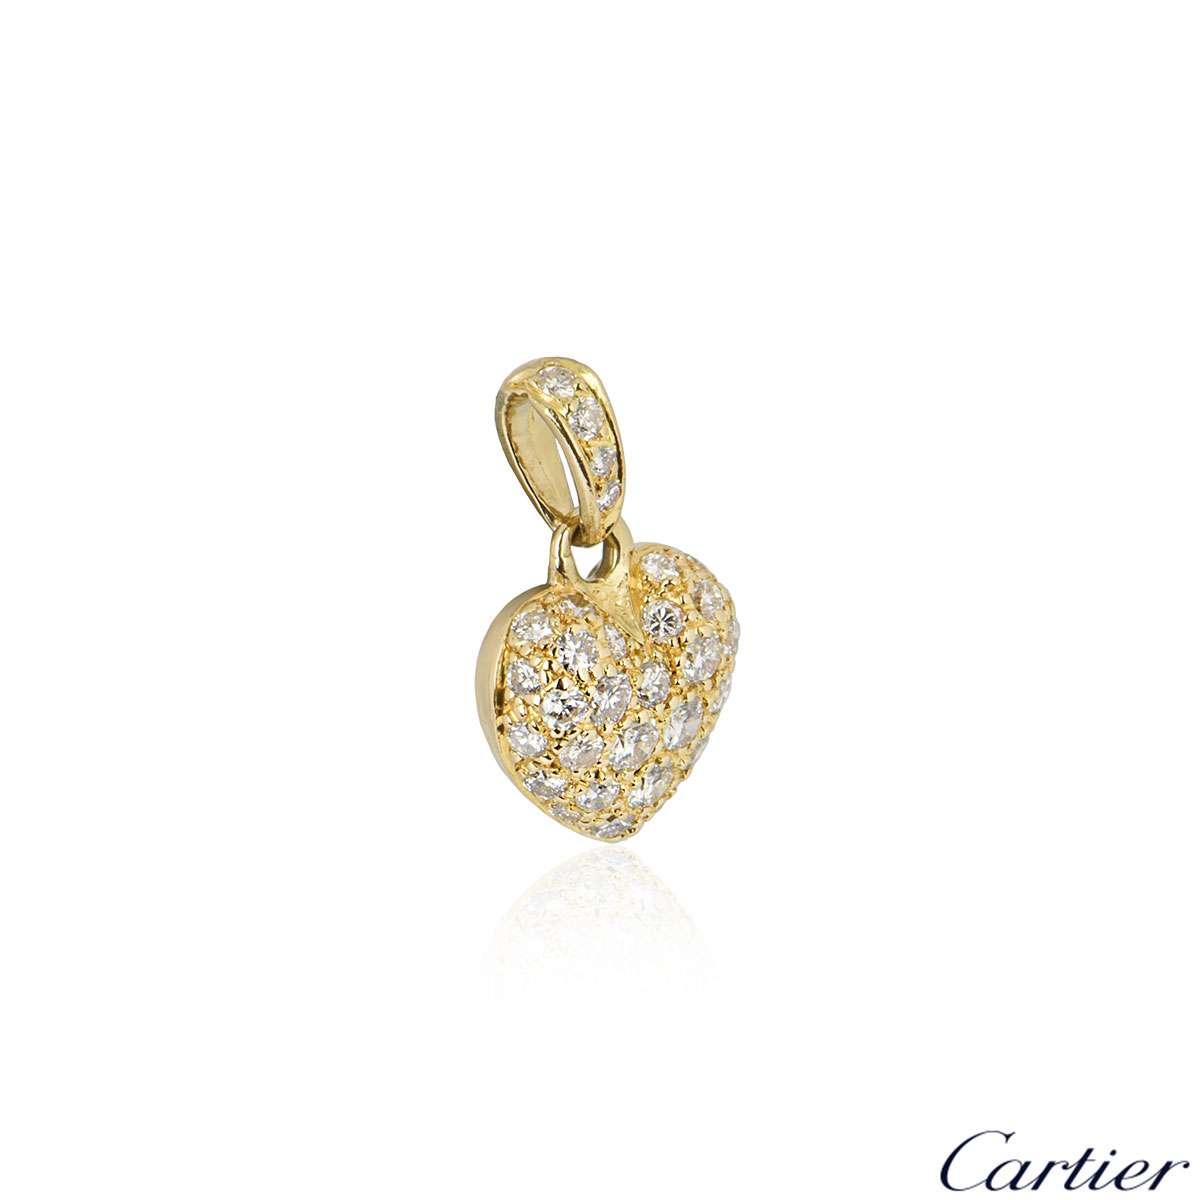 Cartier Yellow Gold Diamond Heart Charm